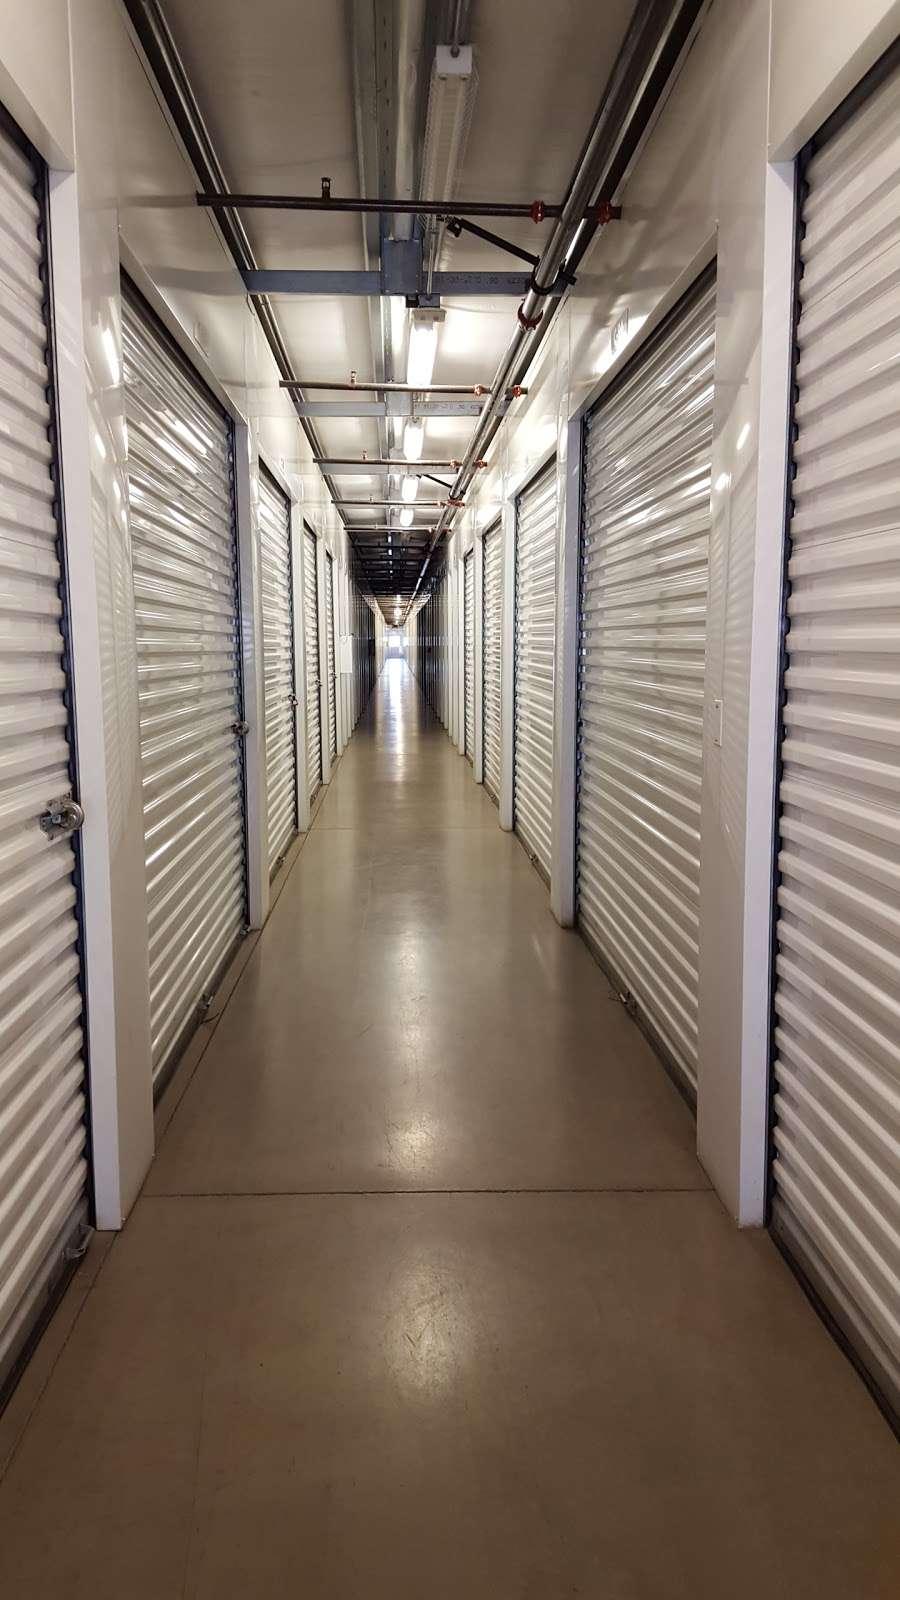 Menifee Ranch Self Storage & RV - moving company  | Photo 4 of 10 | Address: 30125 US Highway 74, Homeland, CA 92548, USA | Phone: (951) 900-3951